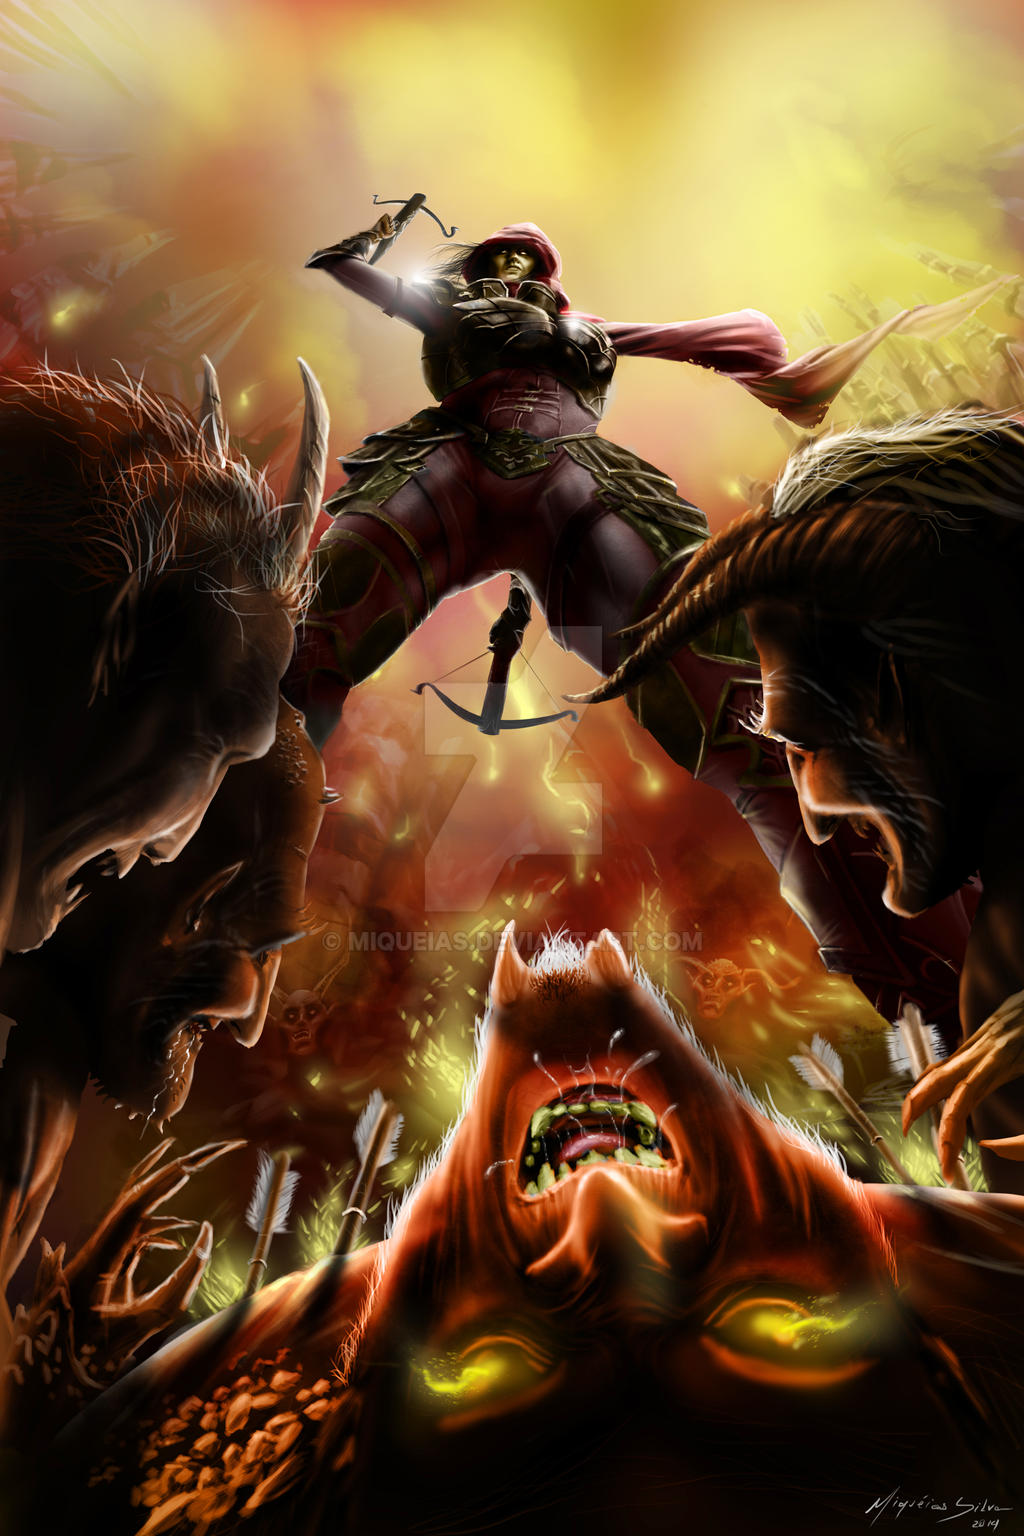 Demon-hunter10 2 by miqueias